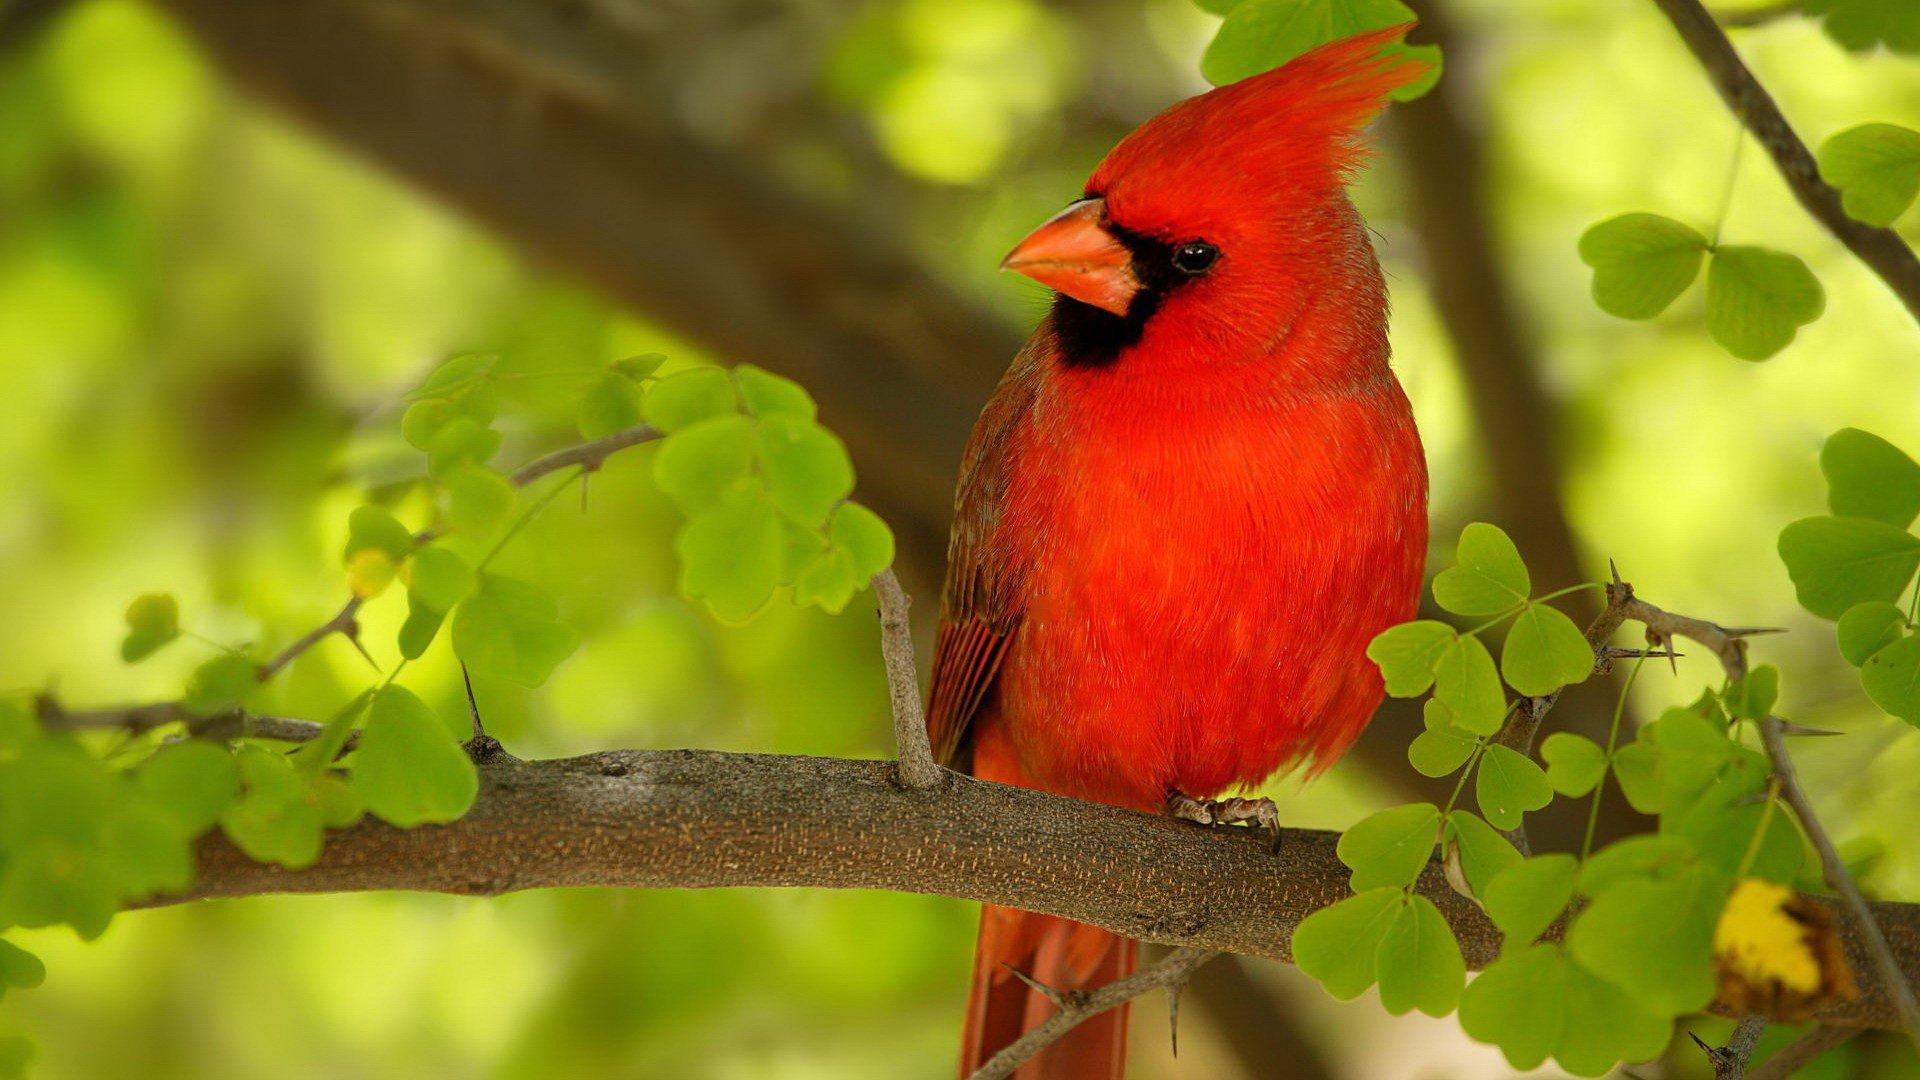 Cardinal hd wallpaper background image 1920x1080 id - Animal and bird hd wallpaper ...